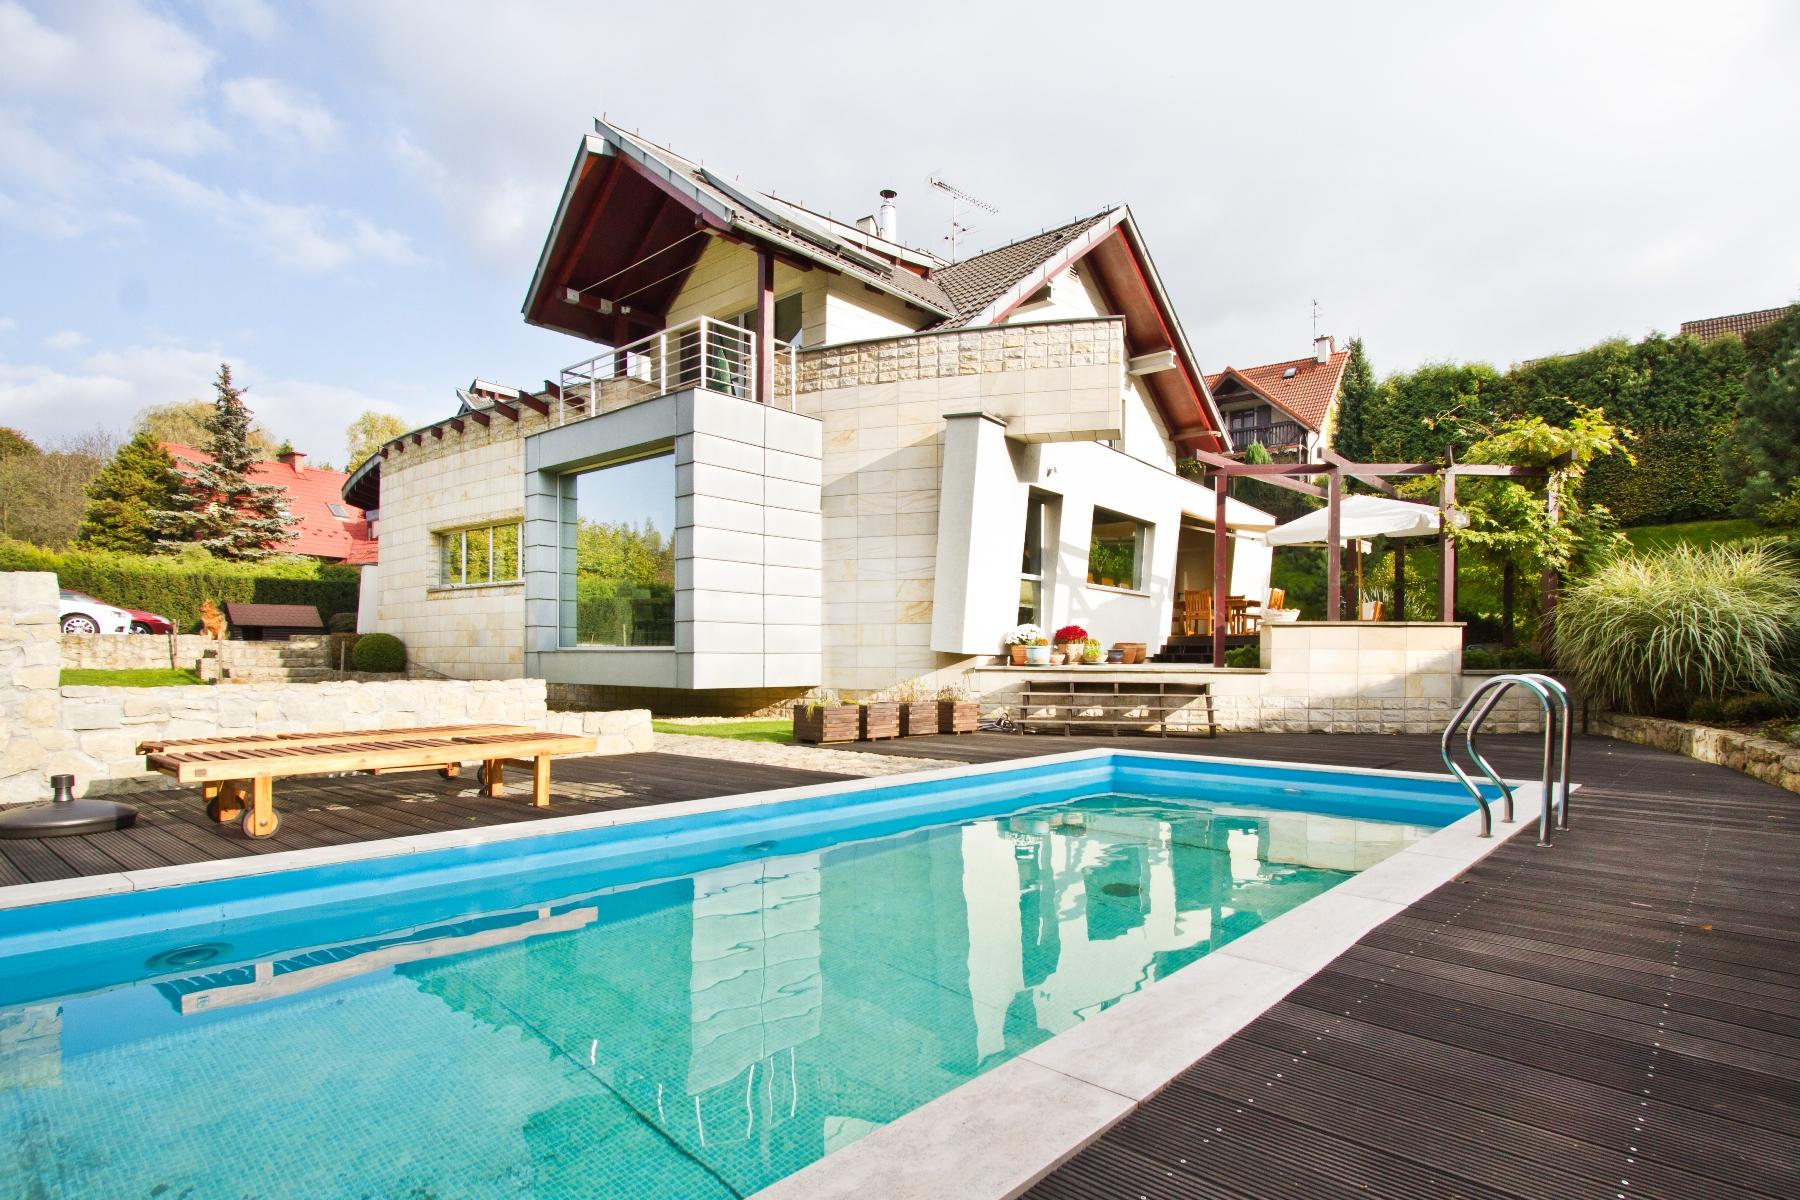 Single Family Home for Sale at Kraków - Rząska Cracow, Malopolska, Poland